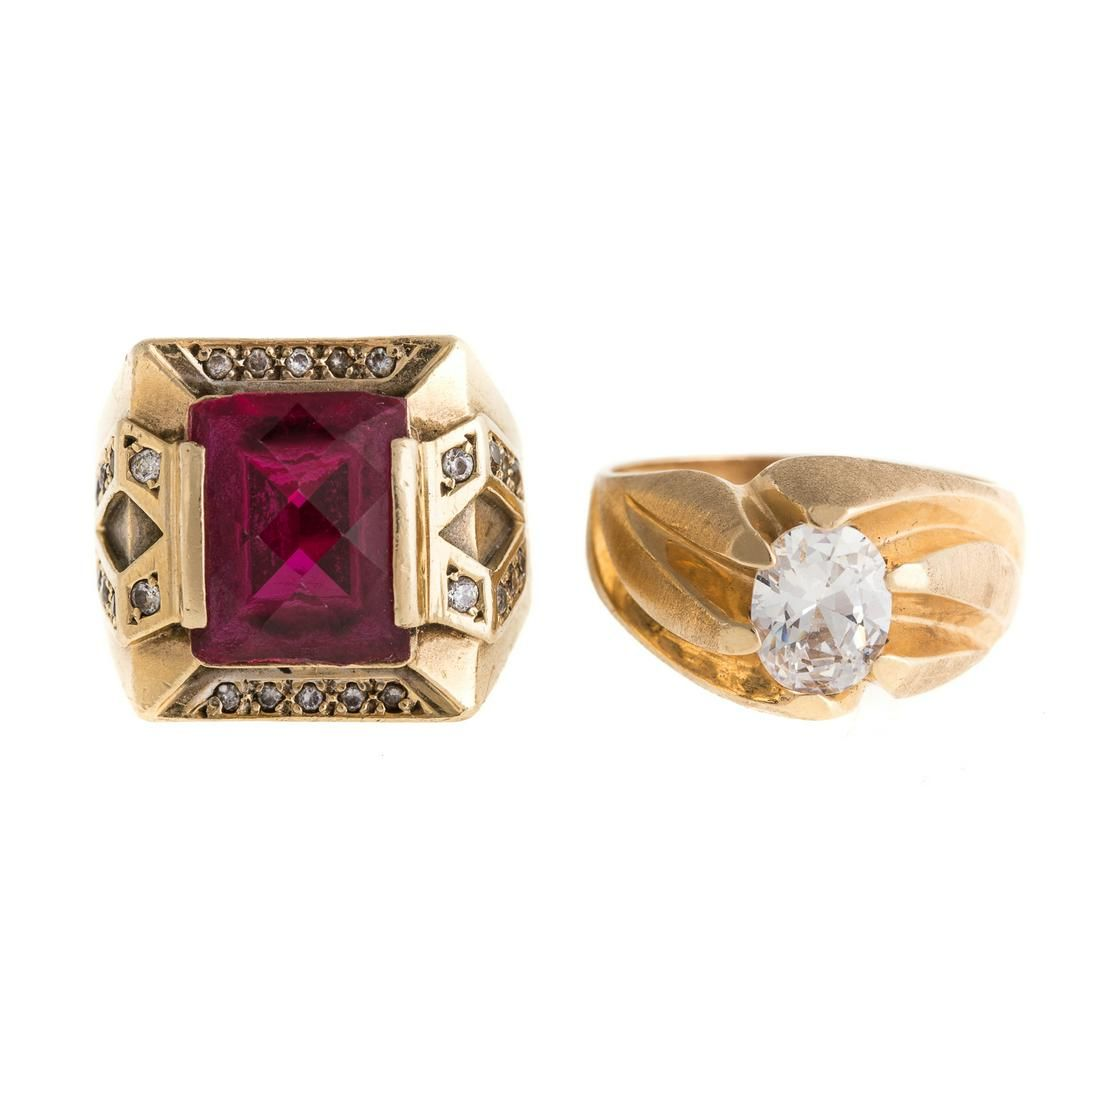 Two Gentlemen's Rings in 14K Gold